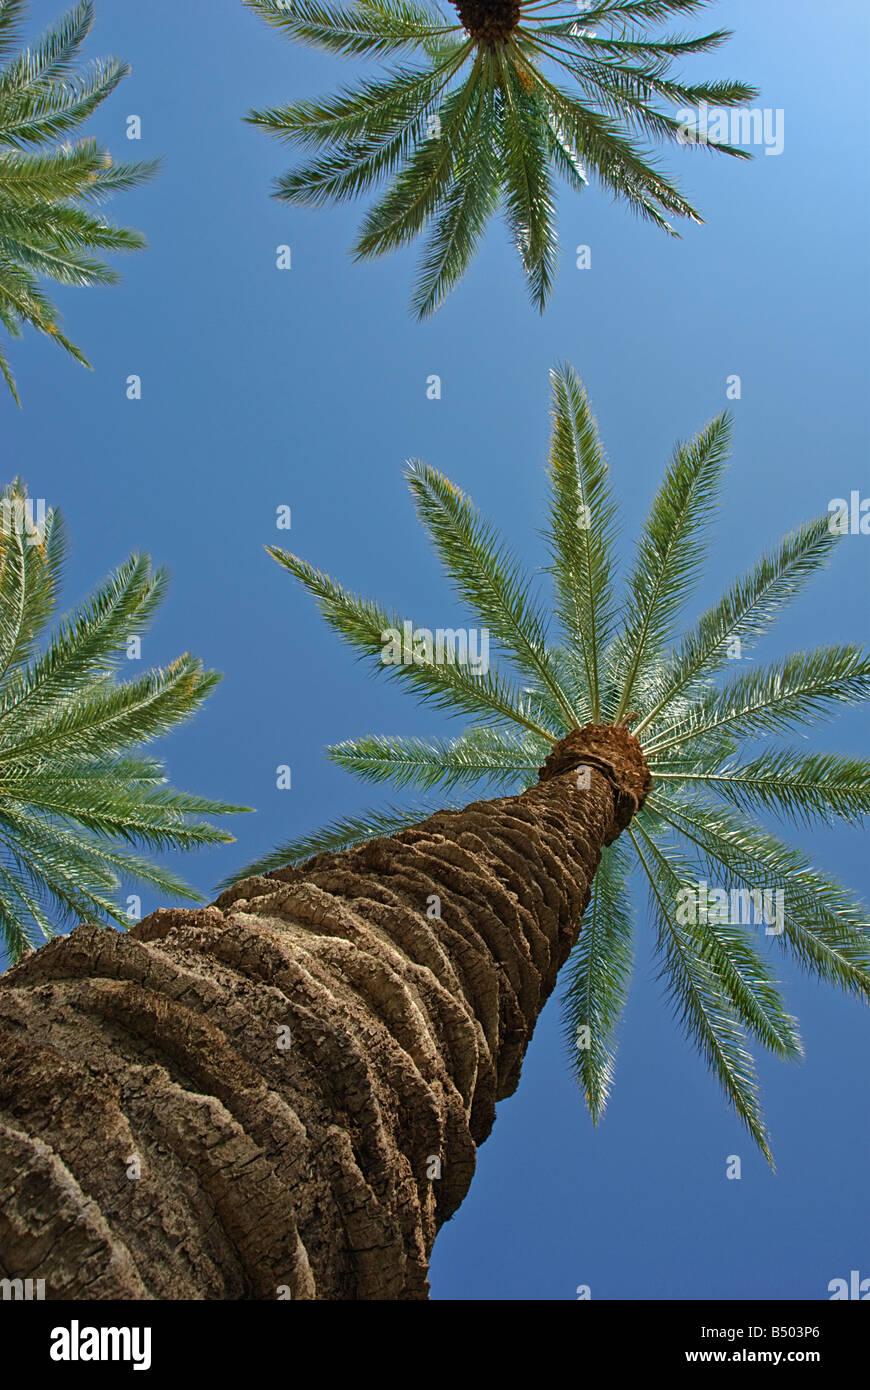 Palm Trees California palm tree s CA Fan Palm, native California palm tree palm trees Arecaceae Palmae Palmaceae - Stock Image